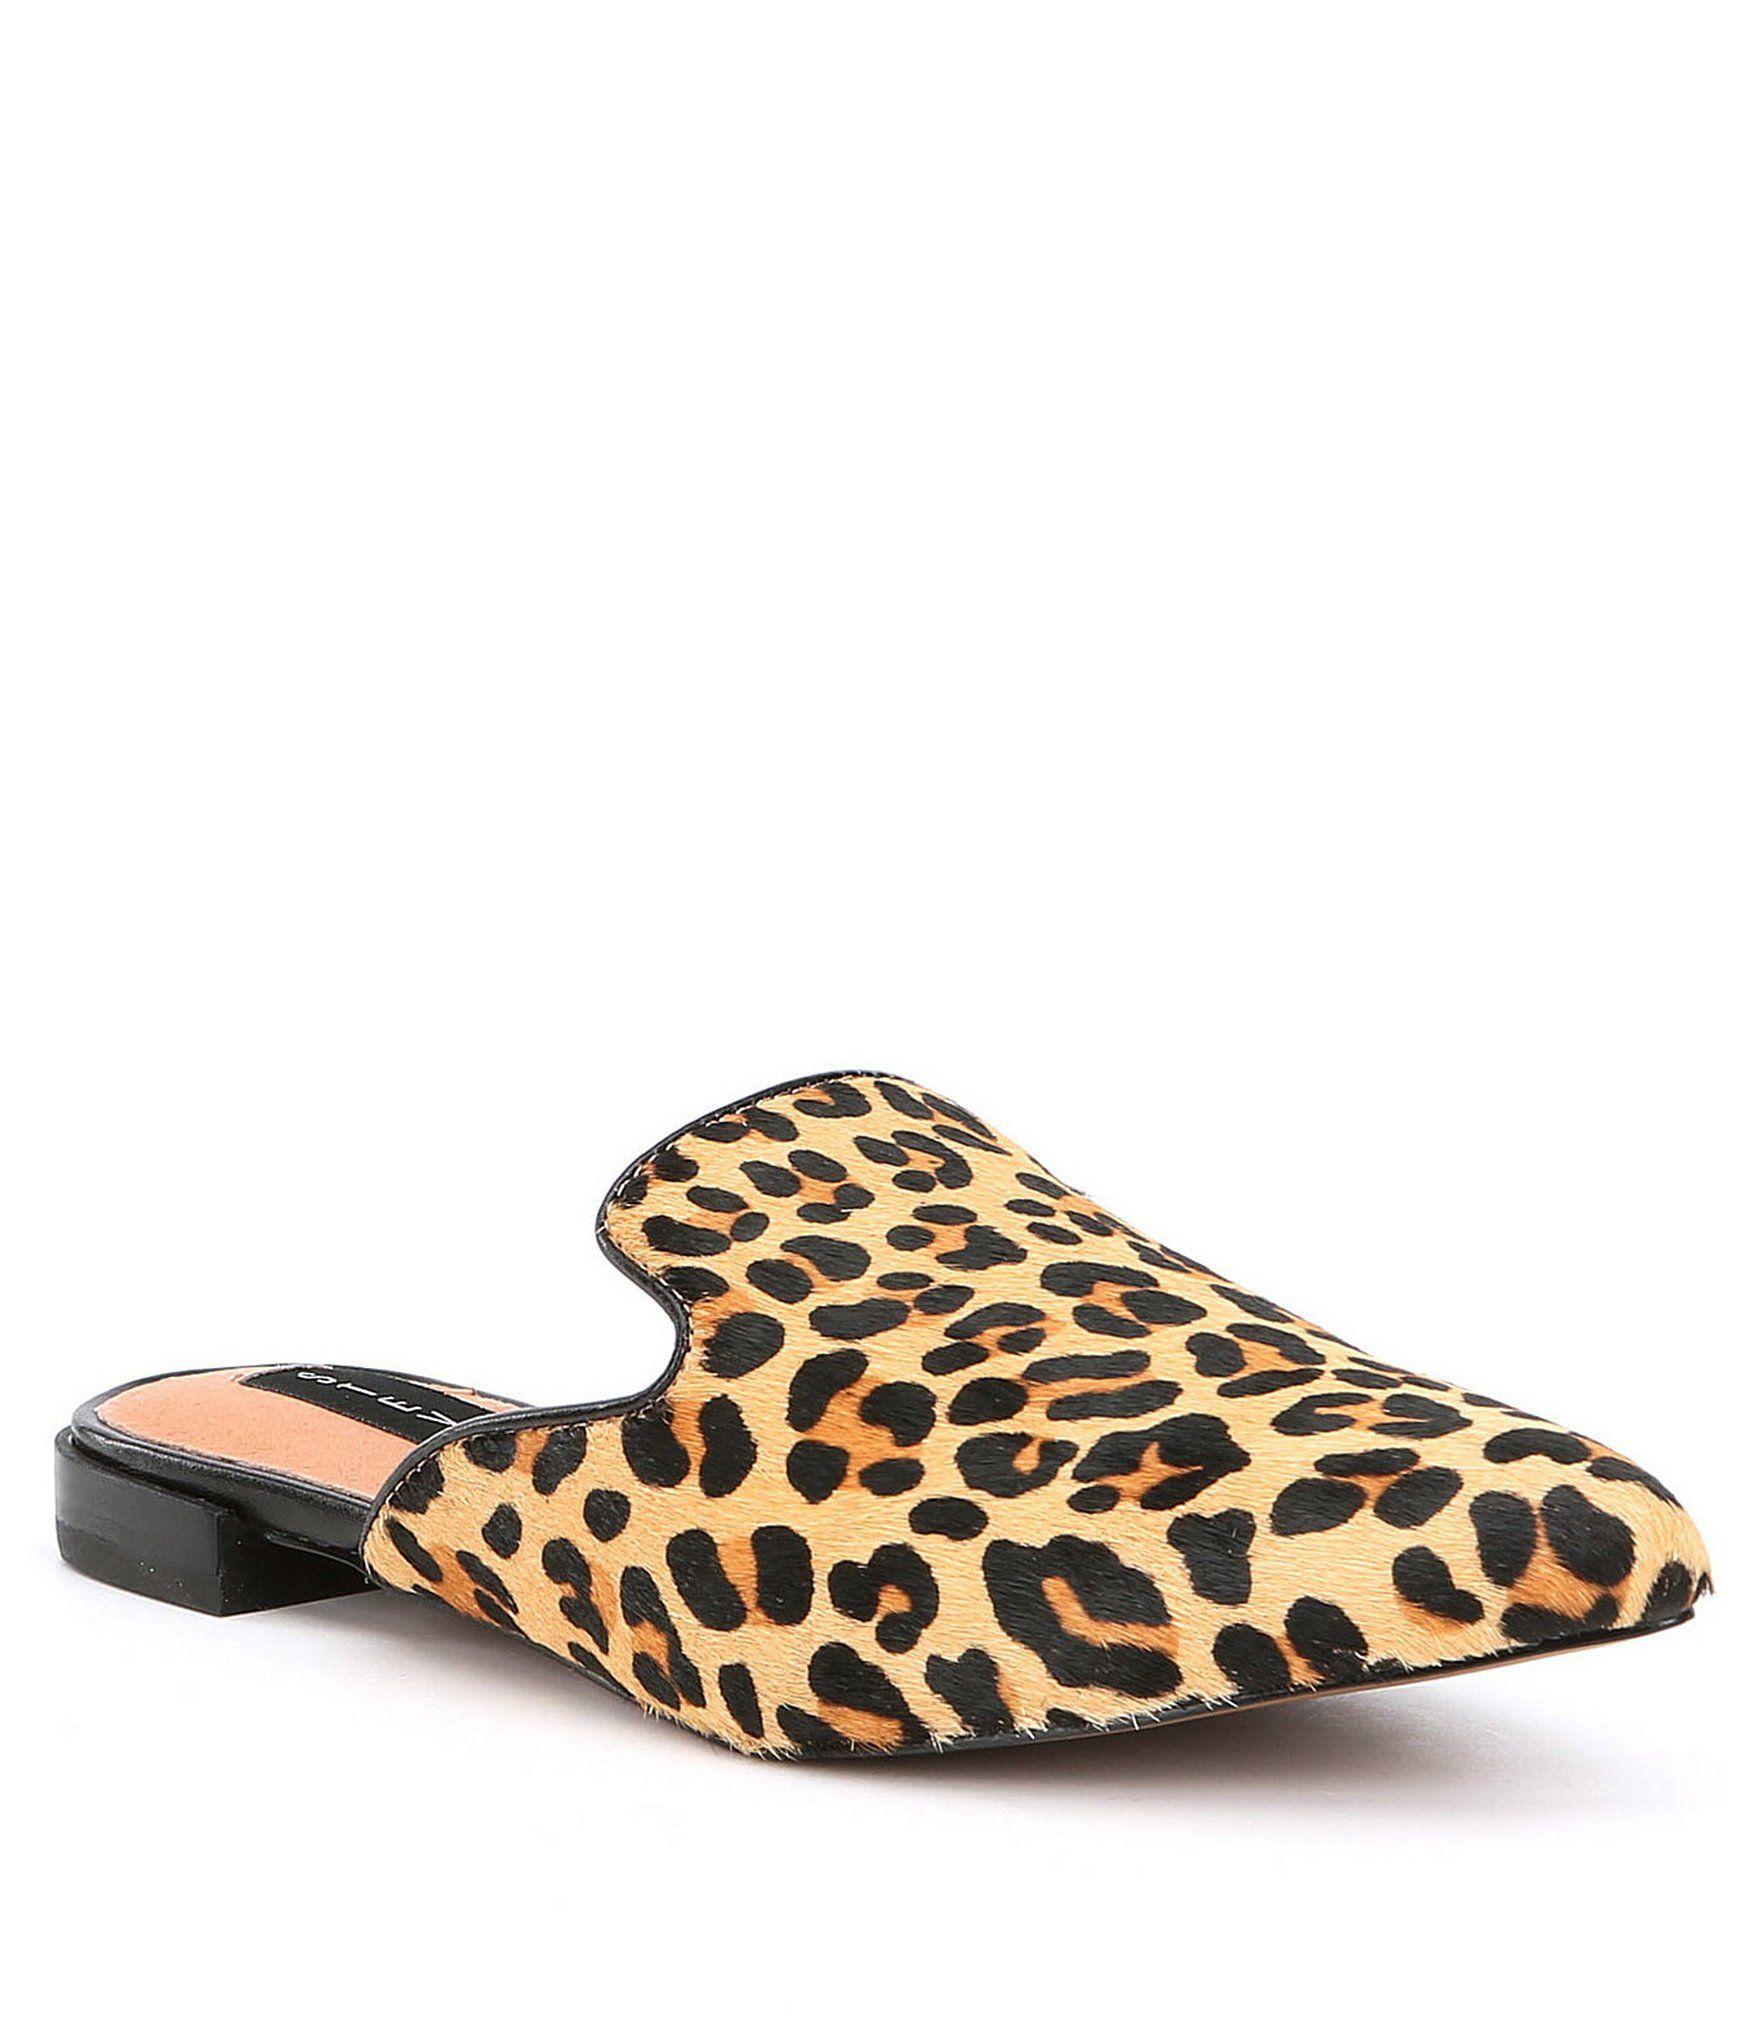 Leopard shoes, Leopard print flats